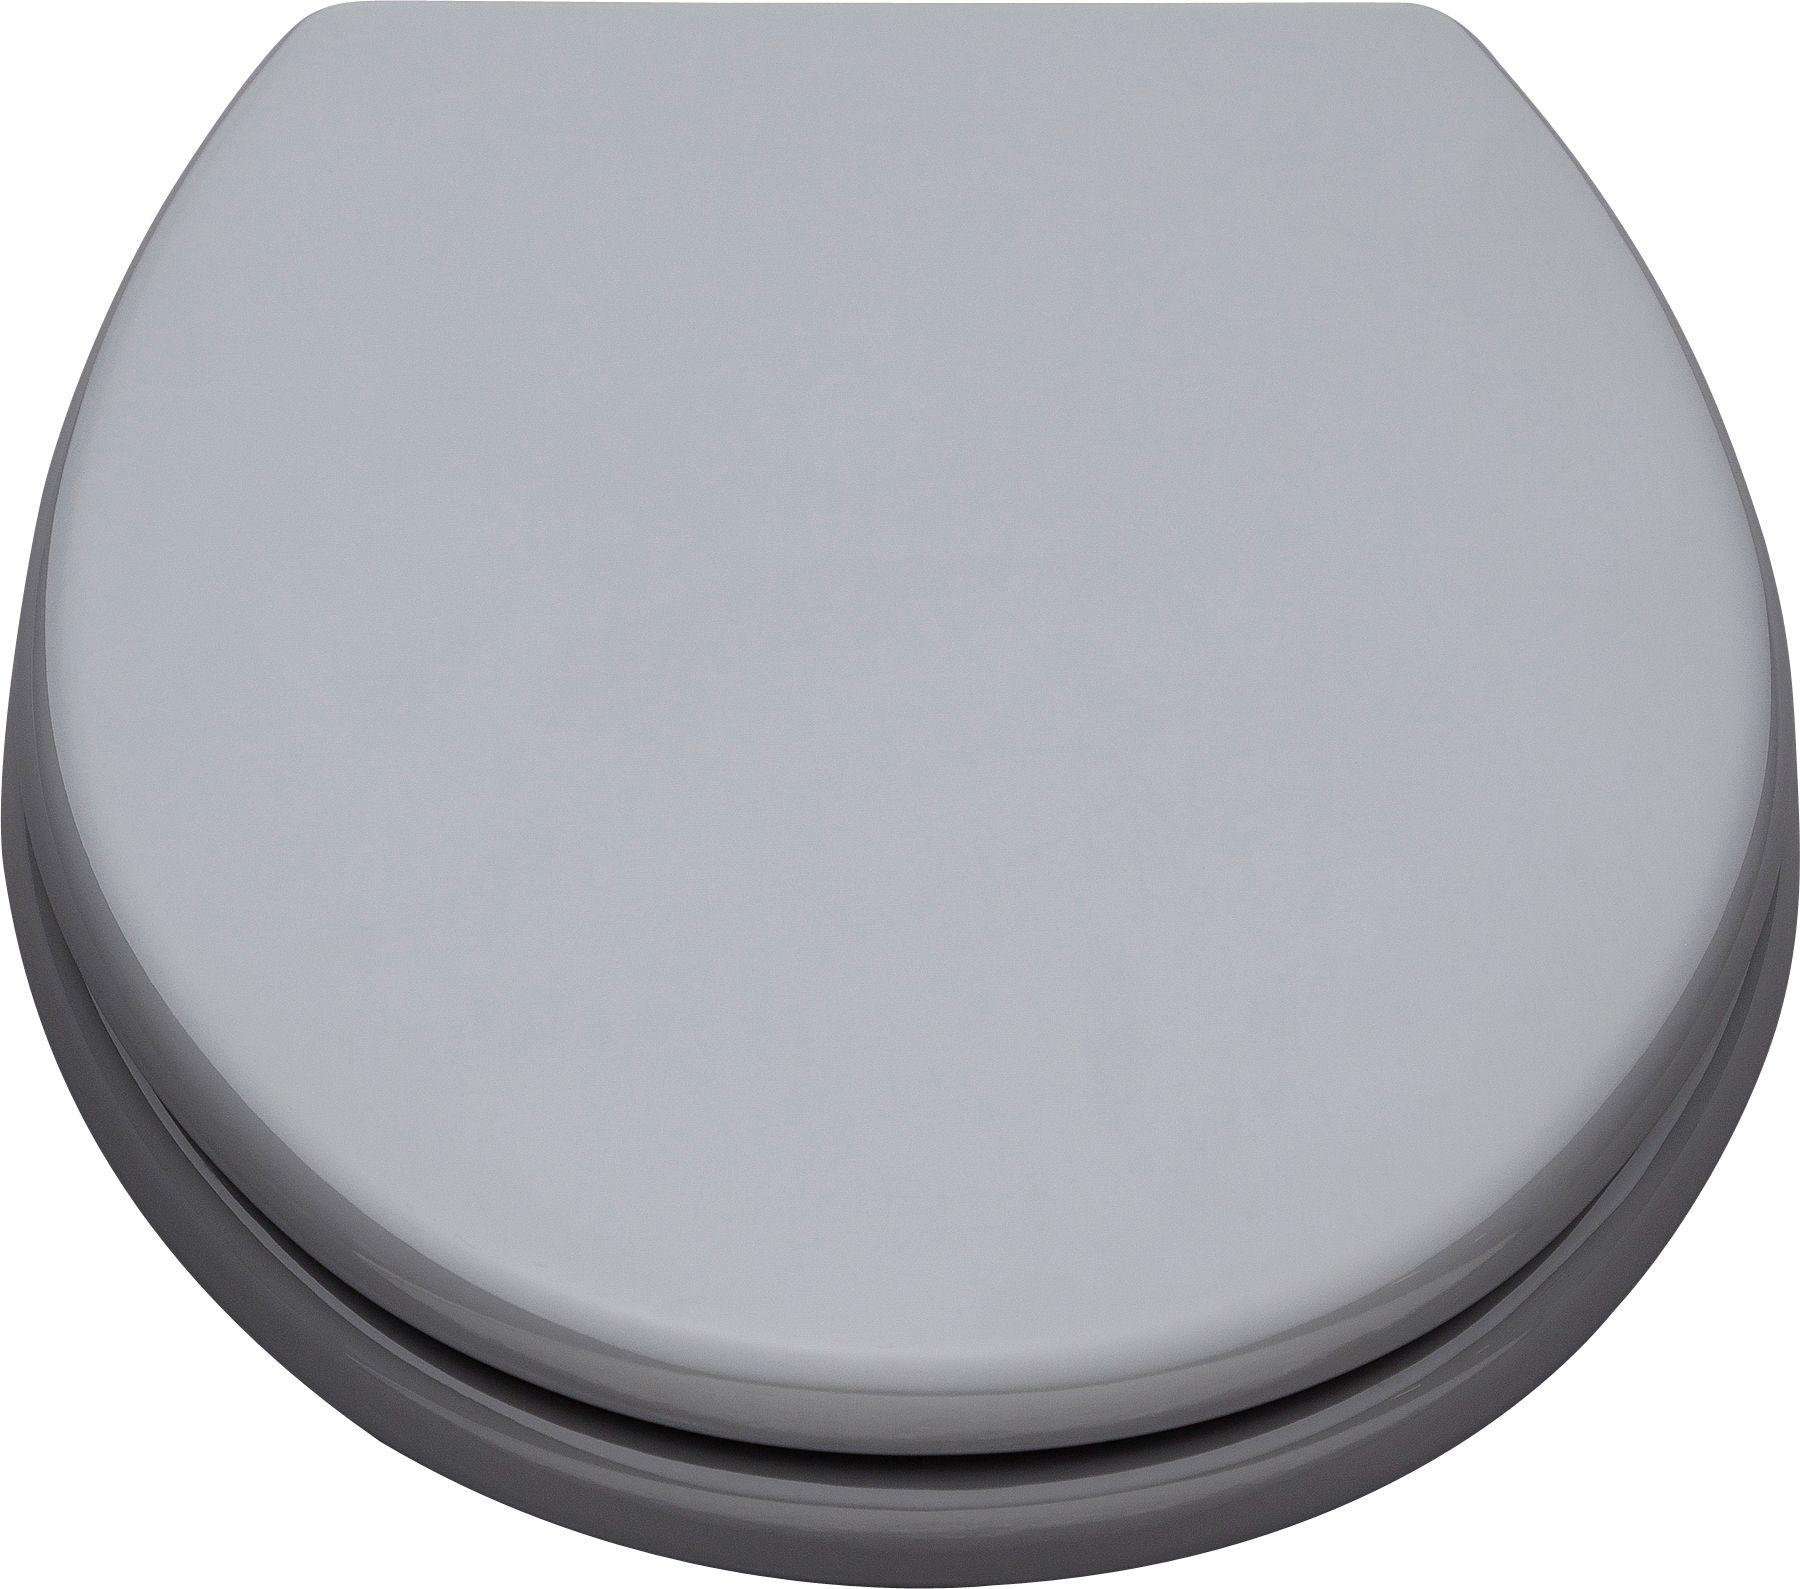 colourmatch moulded wood toilet seat flint grey